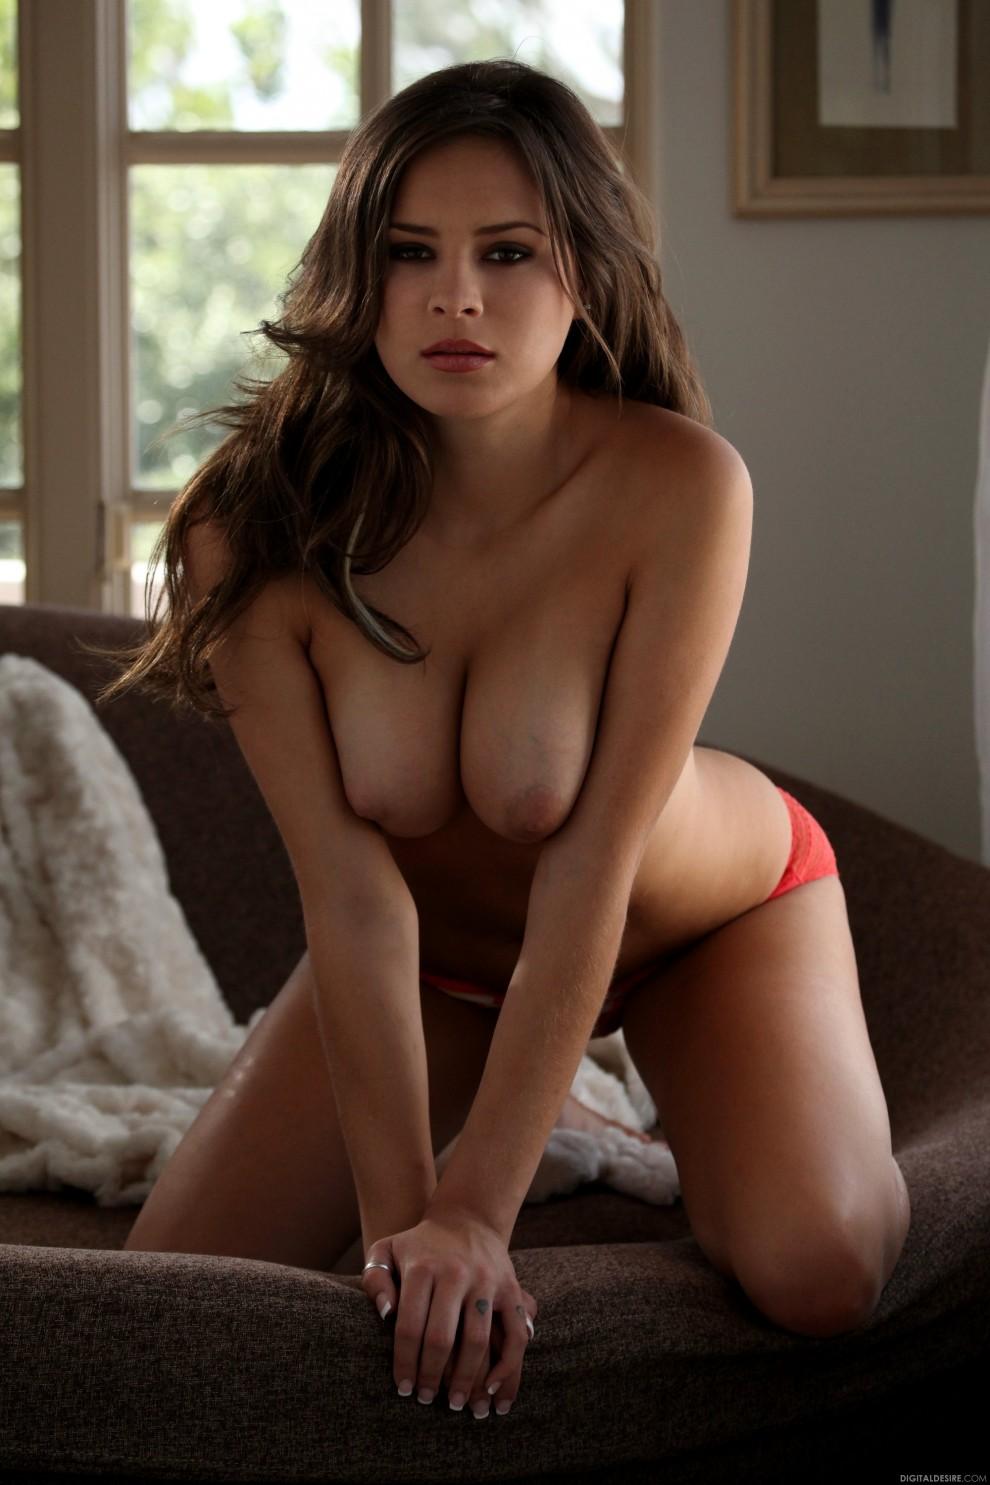 Nude natalya fuck from behind